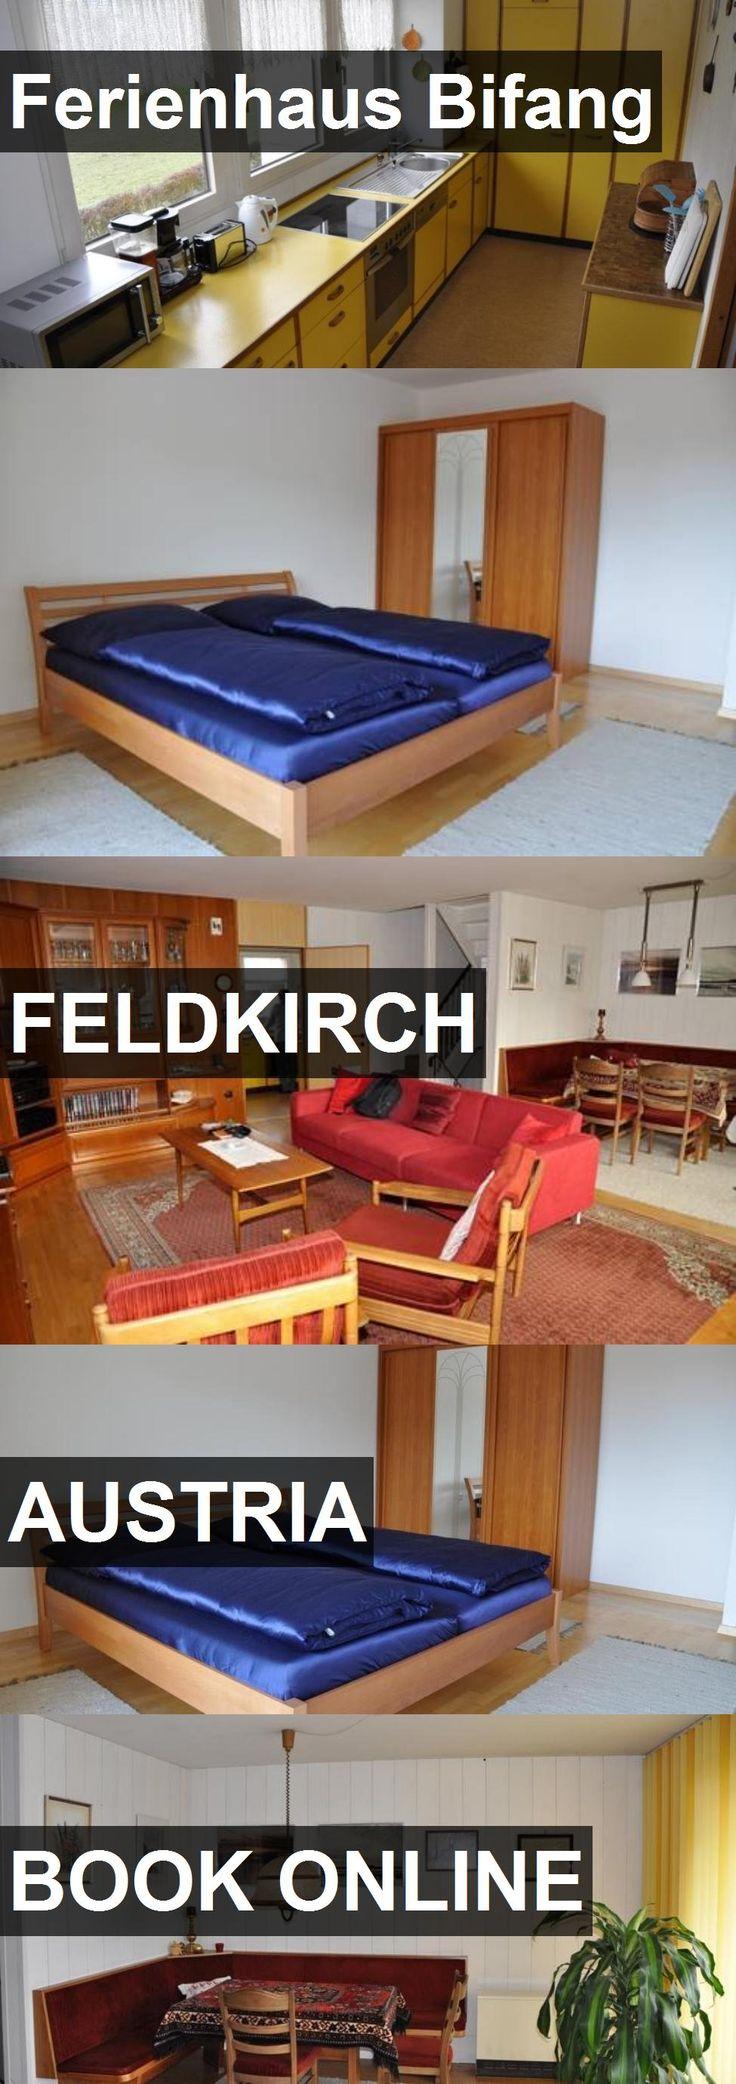 Hotel Ferienhaus Bifang in Feldkirch, Austria. For more information, photos, reviews and best prices please follow the link. #Austria #Feldkirch #FerienhausBifang #hotel #travel #vacation